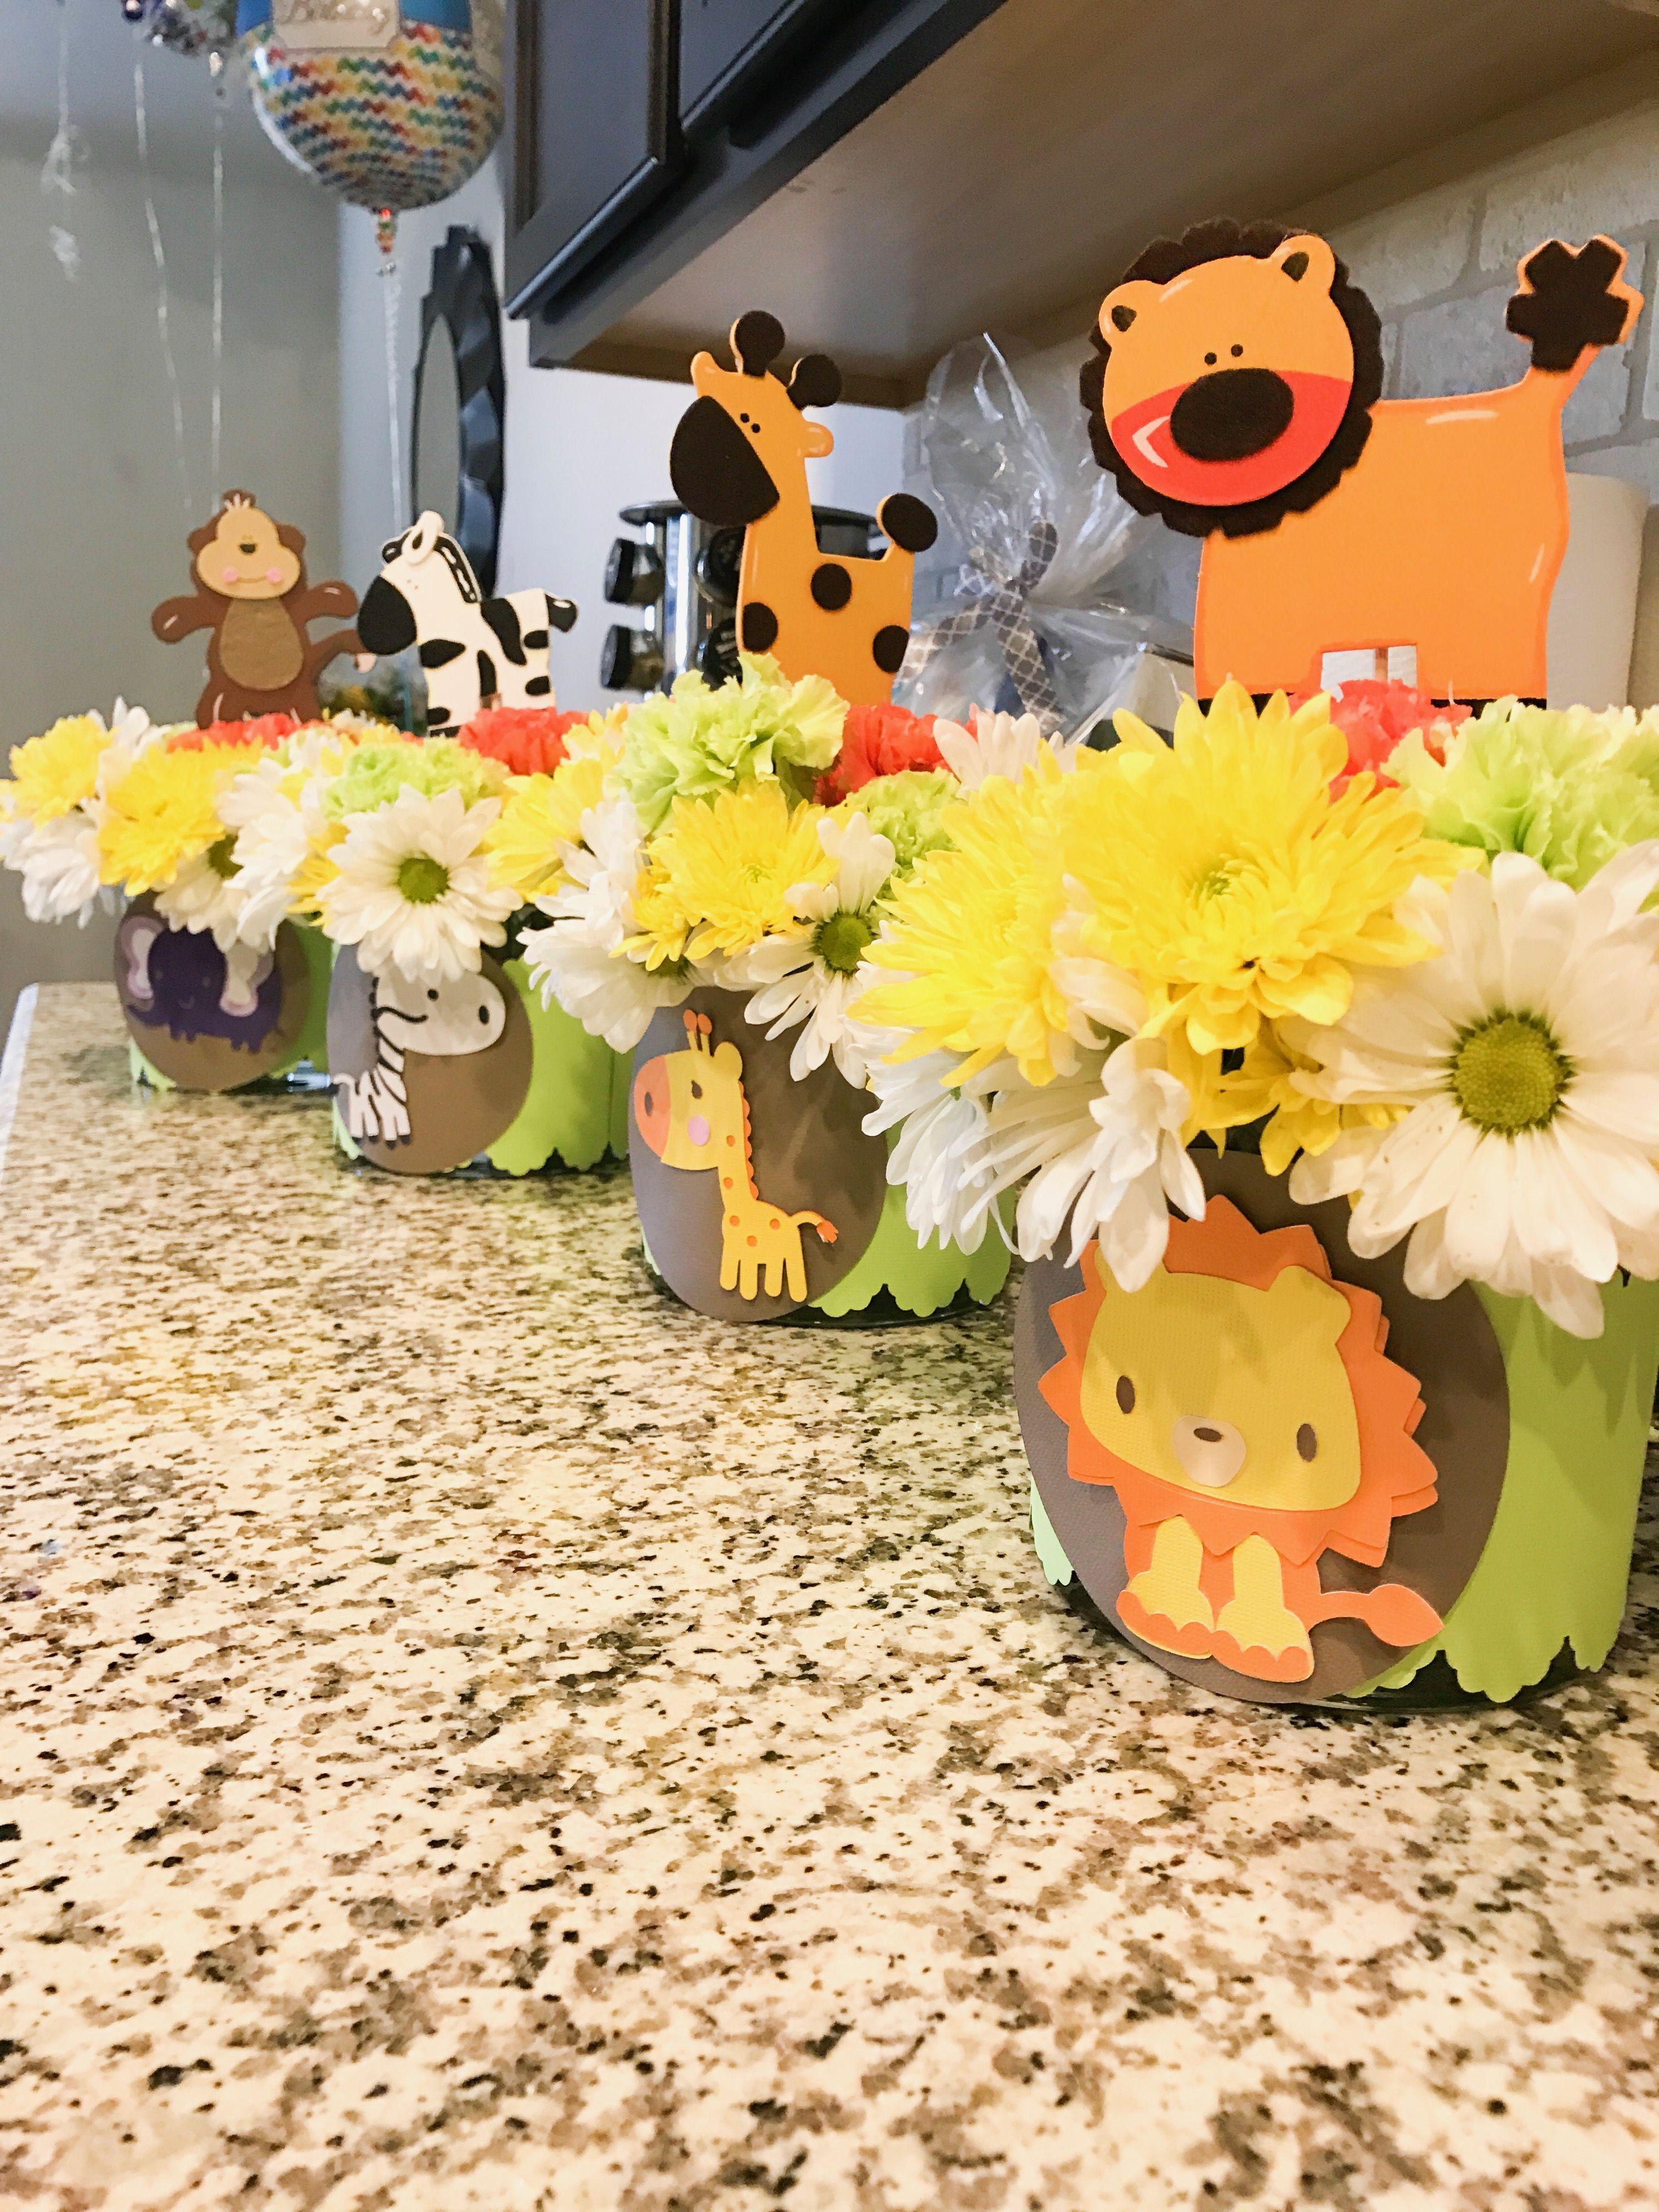 safari theme floral centerpieces for baby shower babych rh pt pinterest com floral centerpiece for baby shower floral centerpieces for baby shower girl